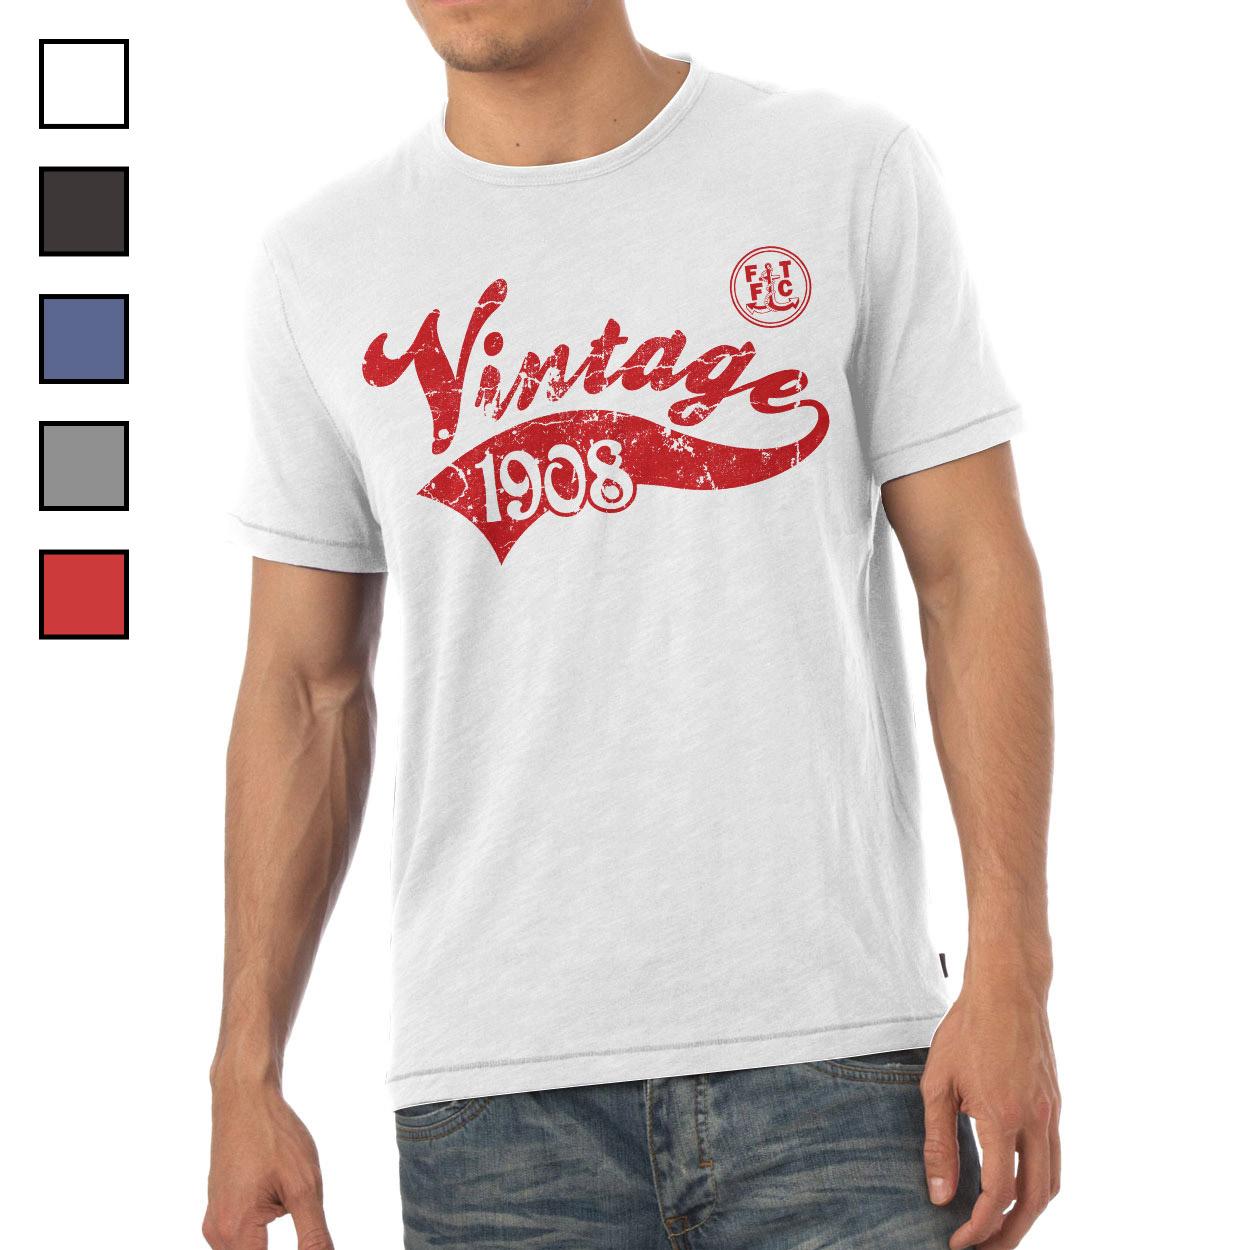 Fleetwood Town FC Mens Vintage T-Shirt